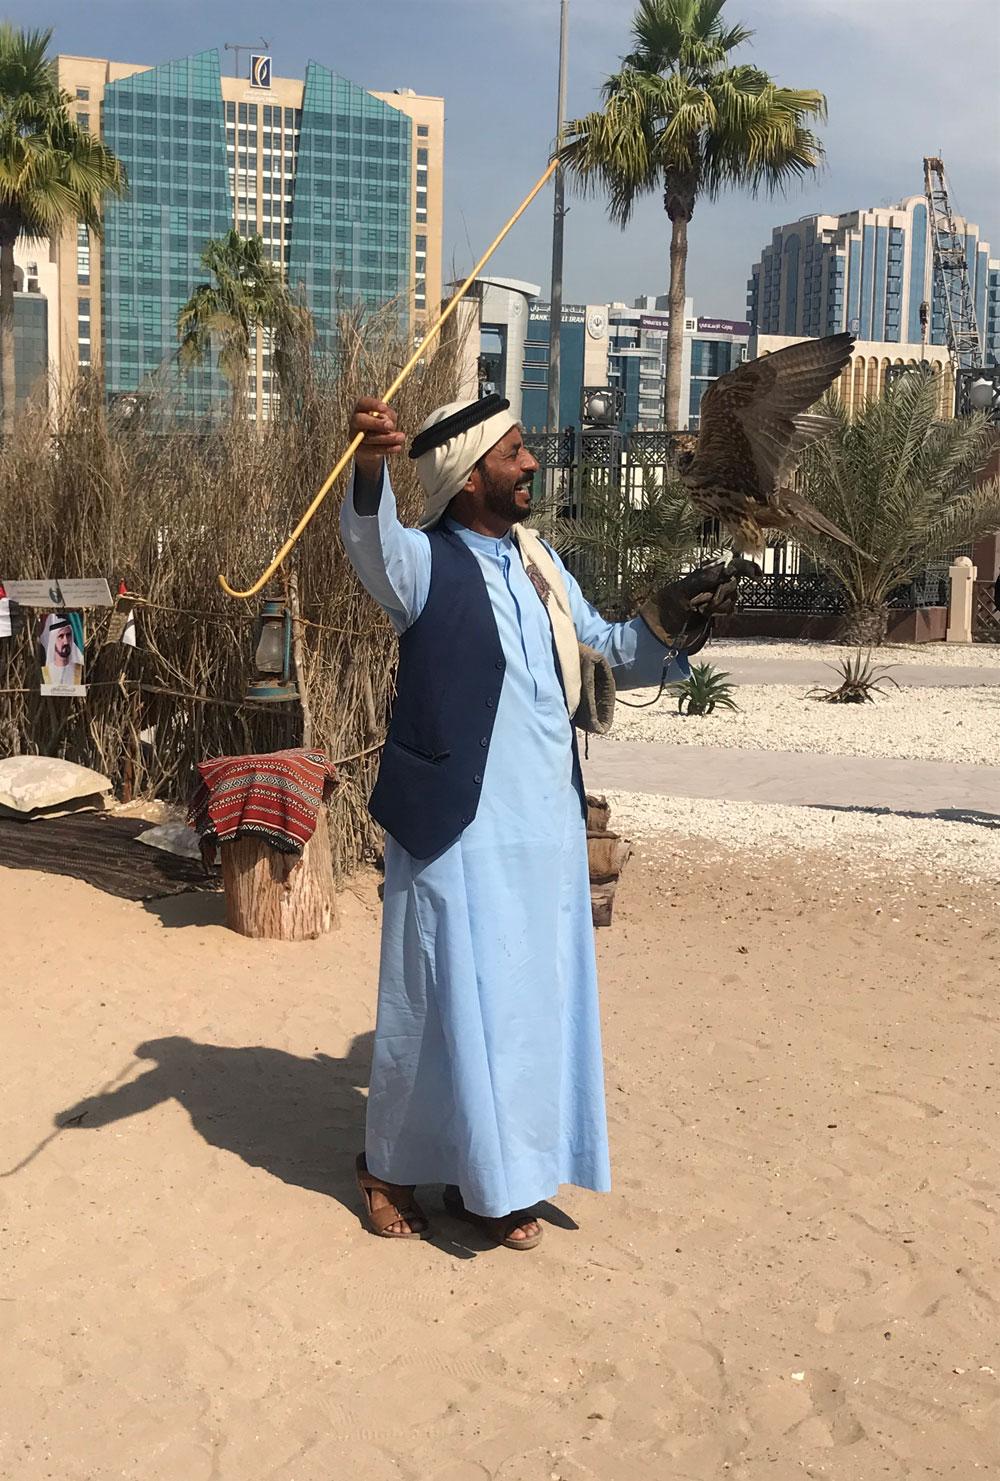 A man poses with his falcon in the historical Al Fahidi